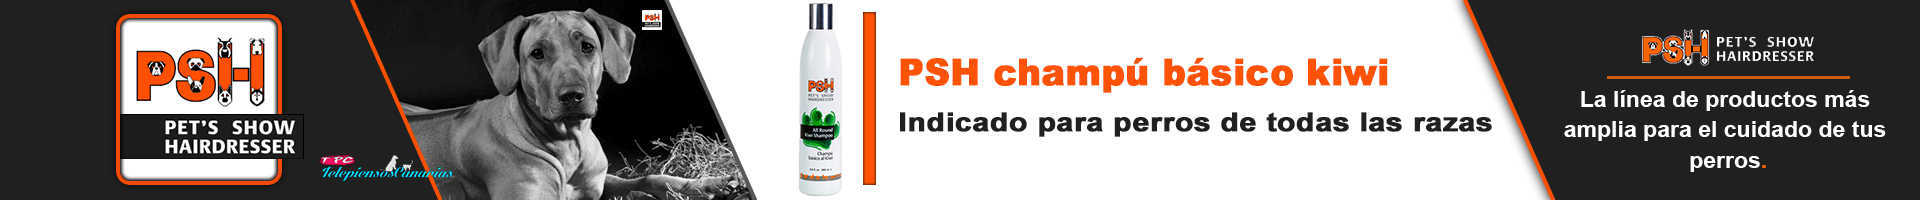 PSH champú para perros básico con kiwi